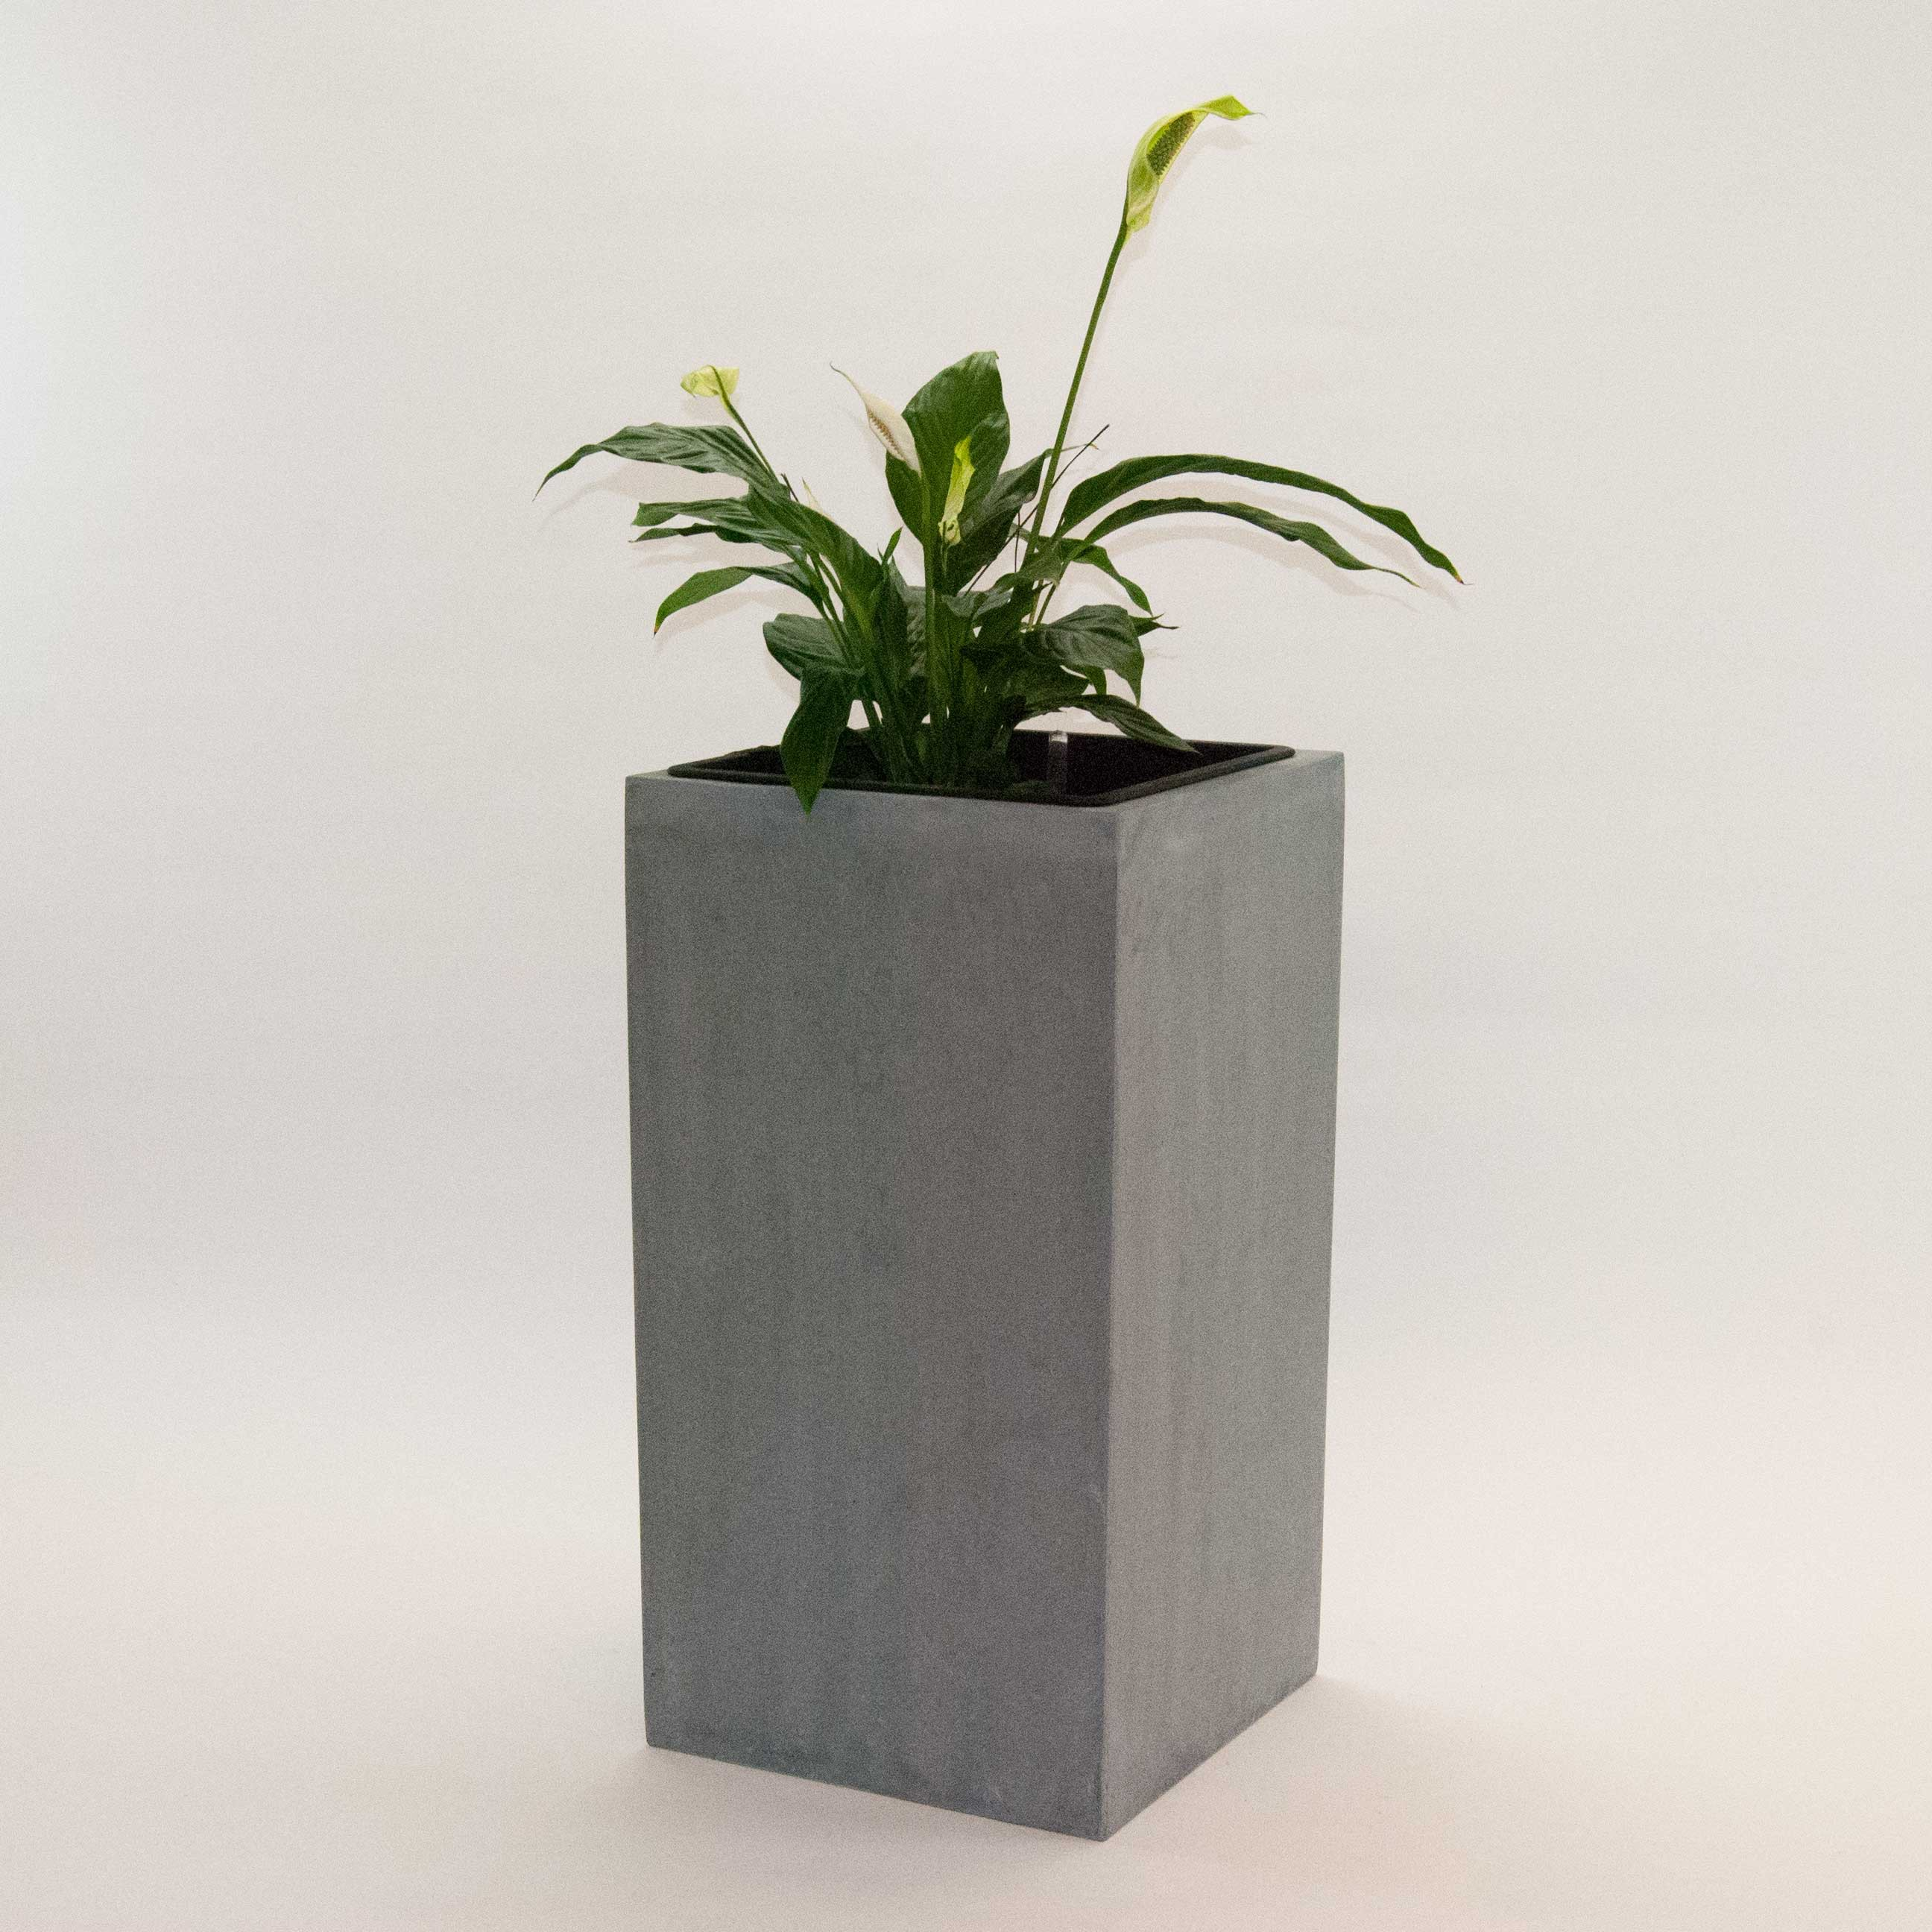 pflanzk bel fiberglas s ule 38x38x70cm grau. Black Bedroom Furniture Sets. Home Design Ideas